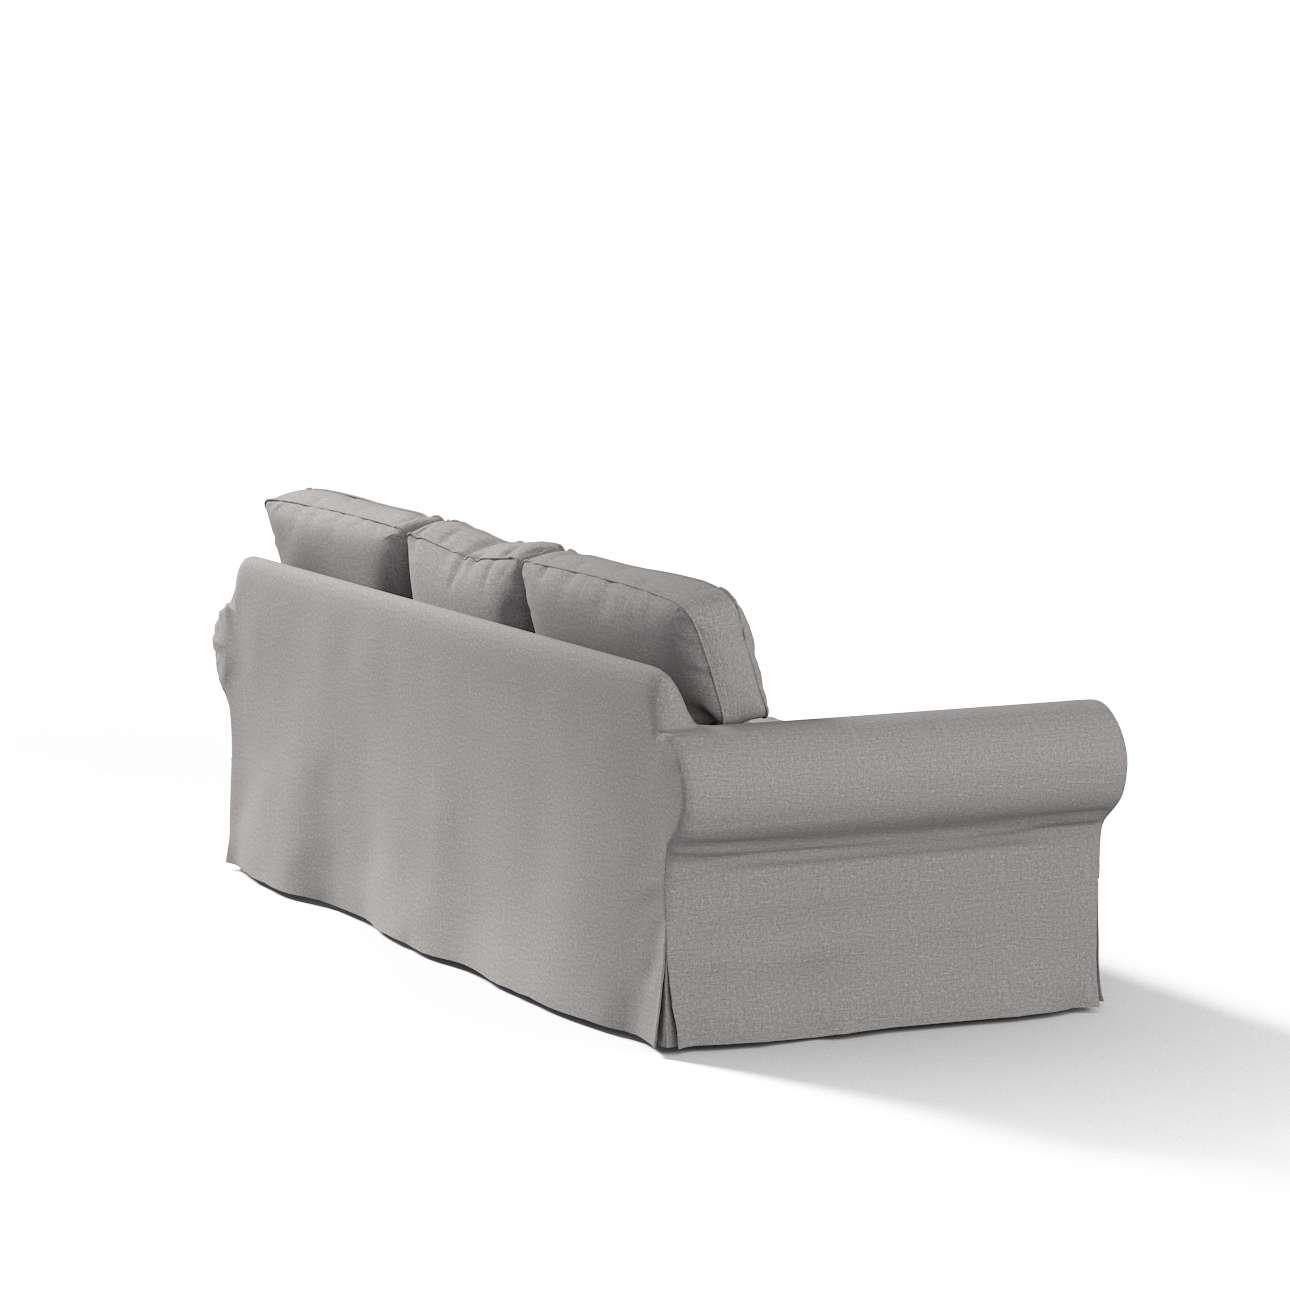 Ektorp 3-Sitzer Schlafsofabezug neues Modell (2013) Ektorp 3-Sitzer, ausklappbar, neues Modell ( 2013) von der Kollektion Edinburgh , Stoff: 115-81